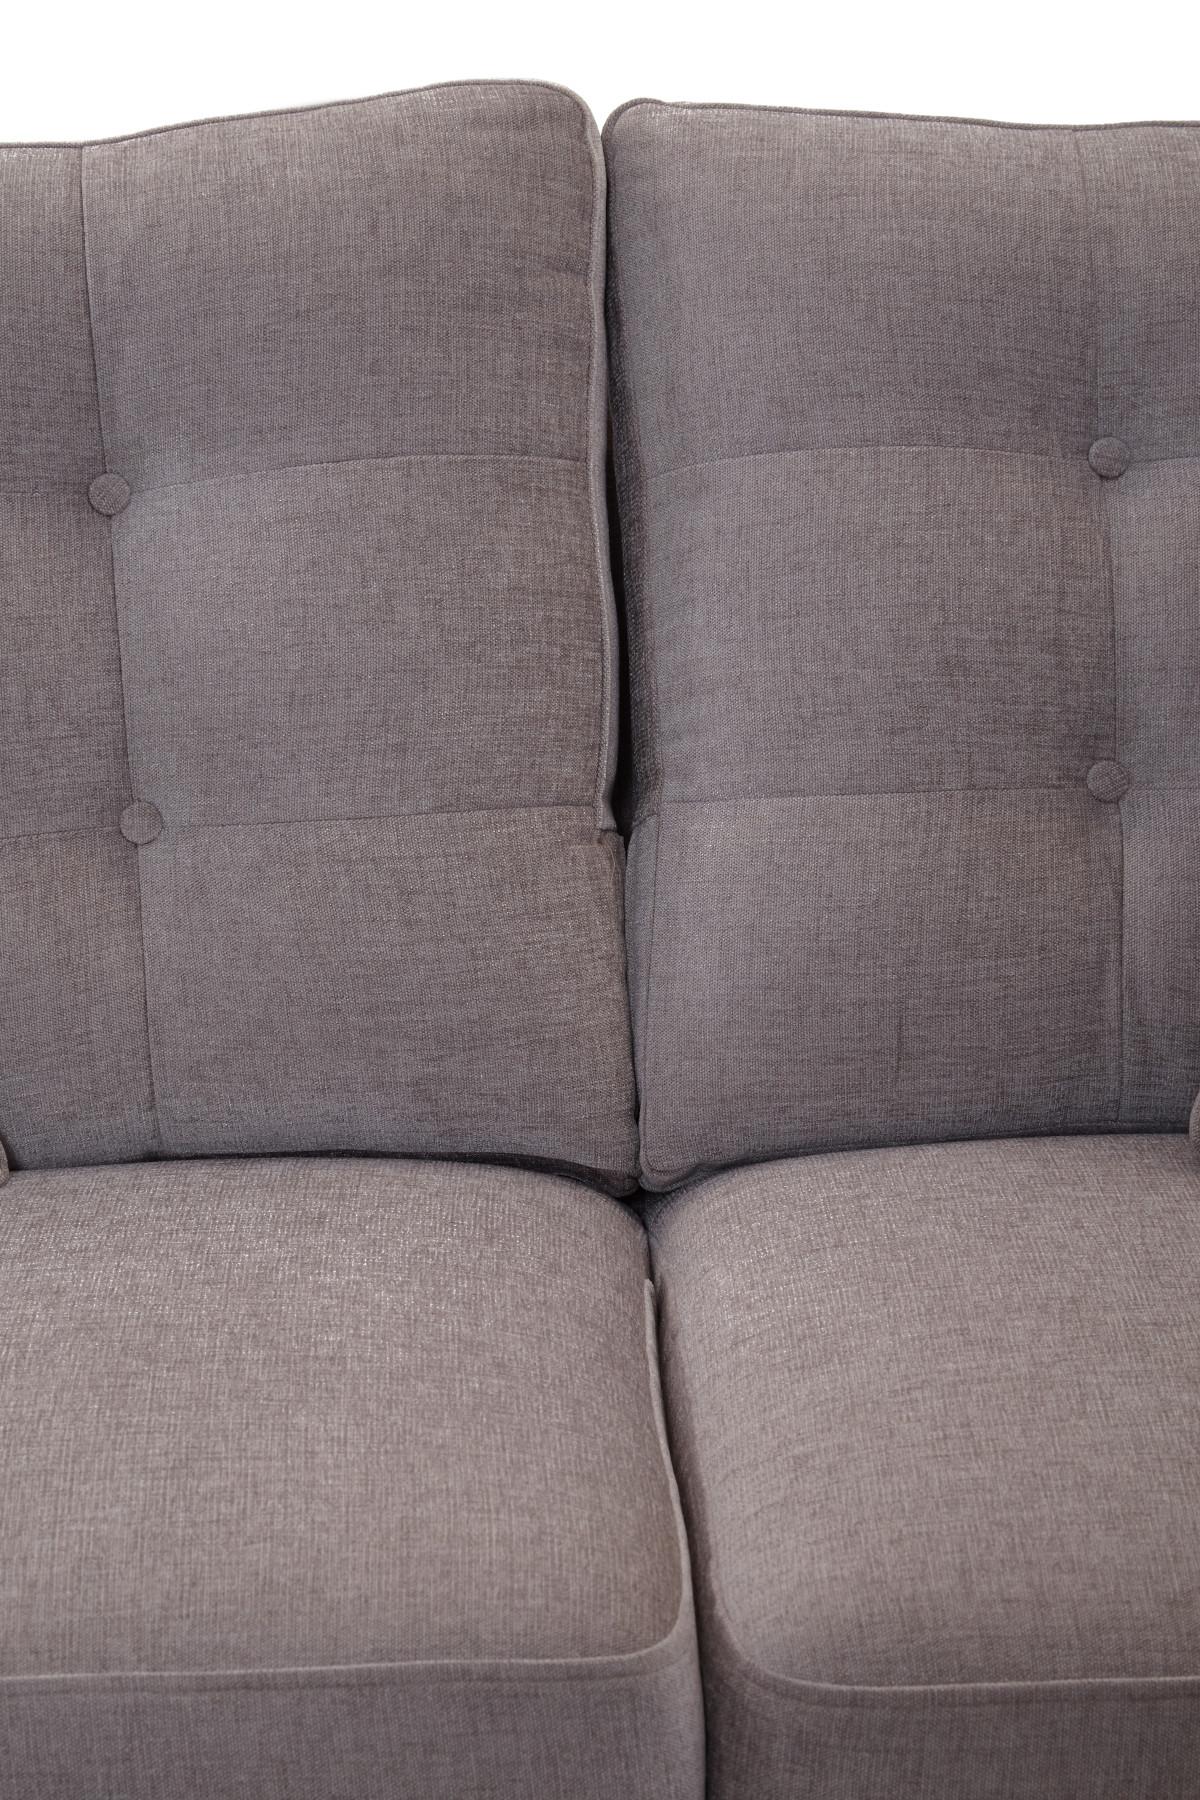 Harrison 2 Seater